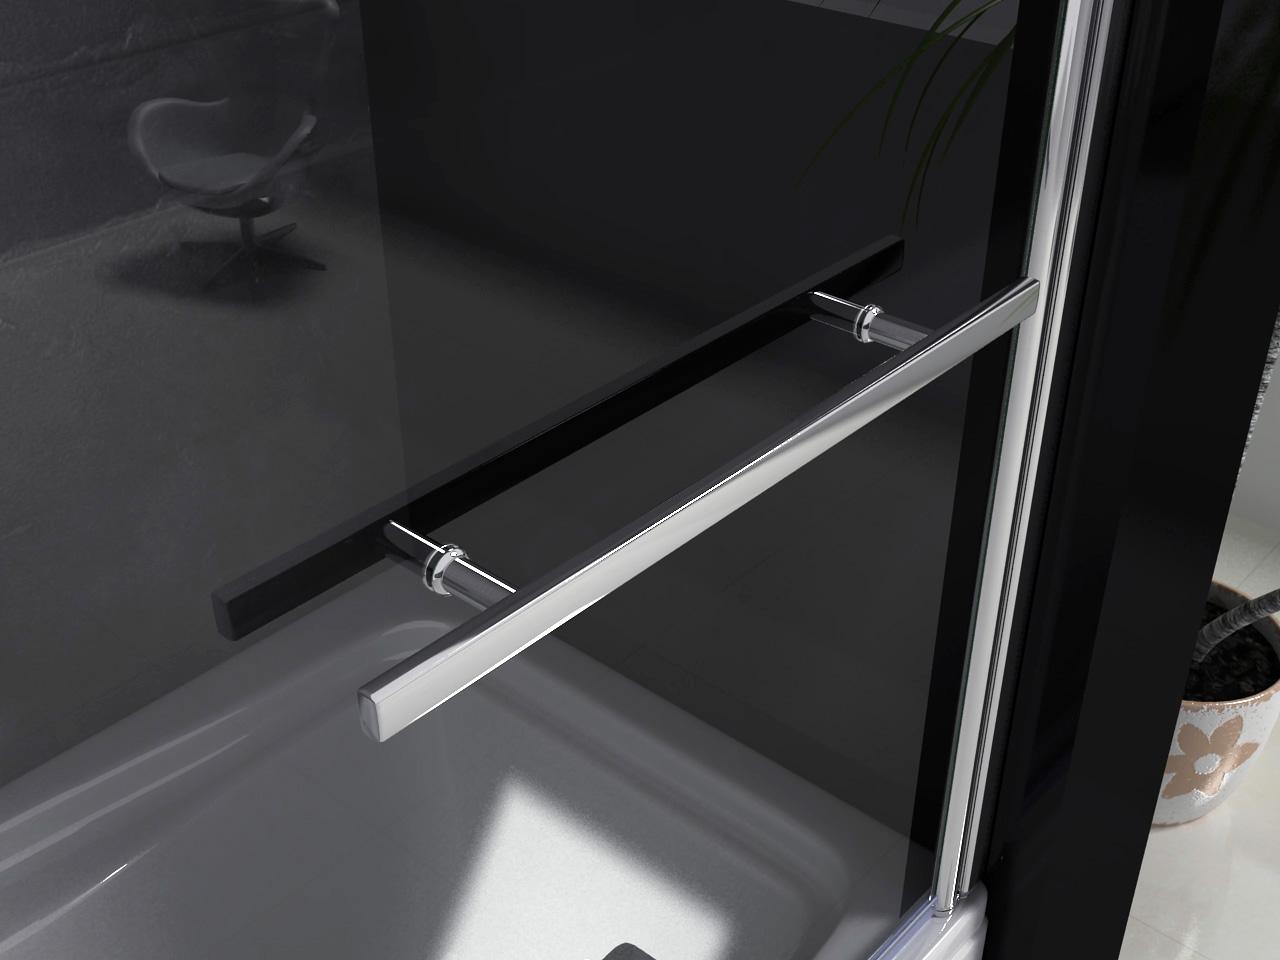 Trennwand Dusche Badewanne : Trennwand Badewanne Dusche : 80x140cm Badewanne Dusche Drehen 180